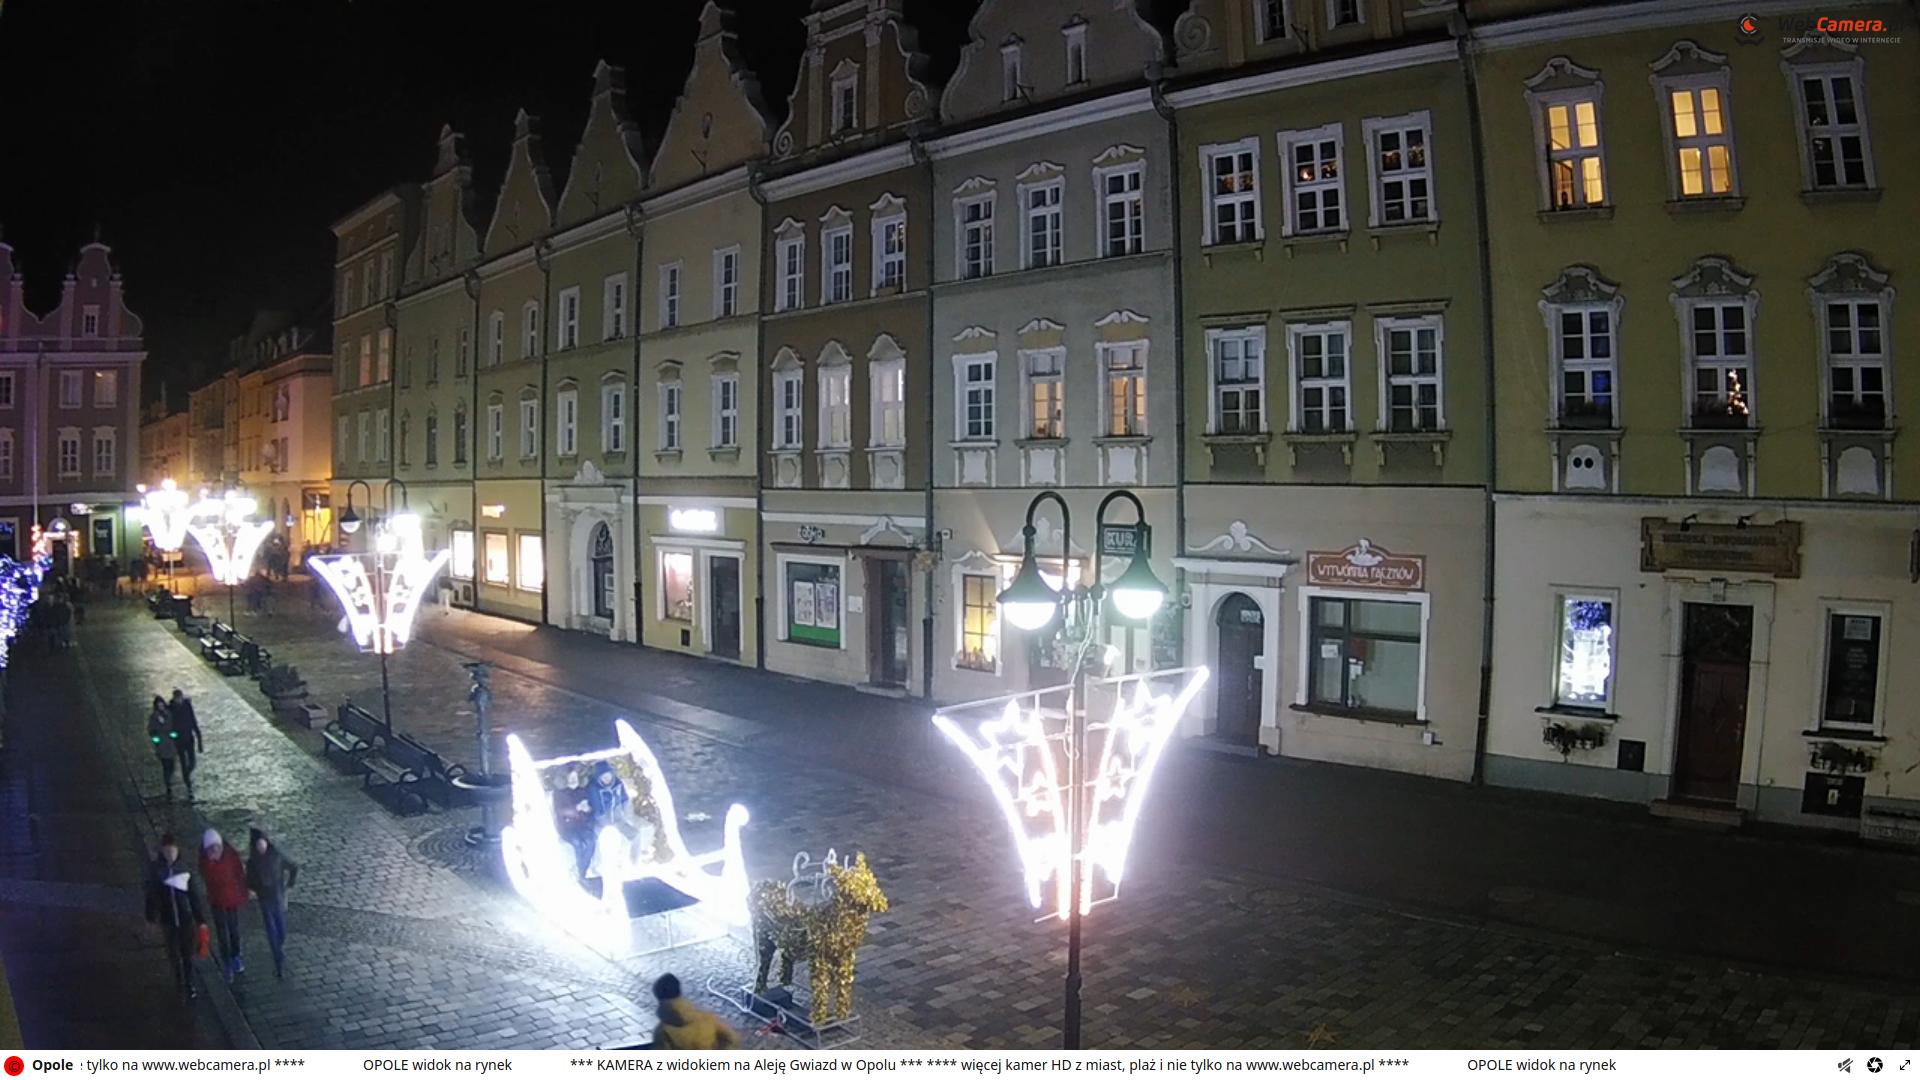 opole poland plaza via webcam new year's dyy 2020